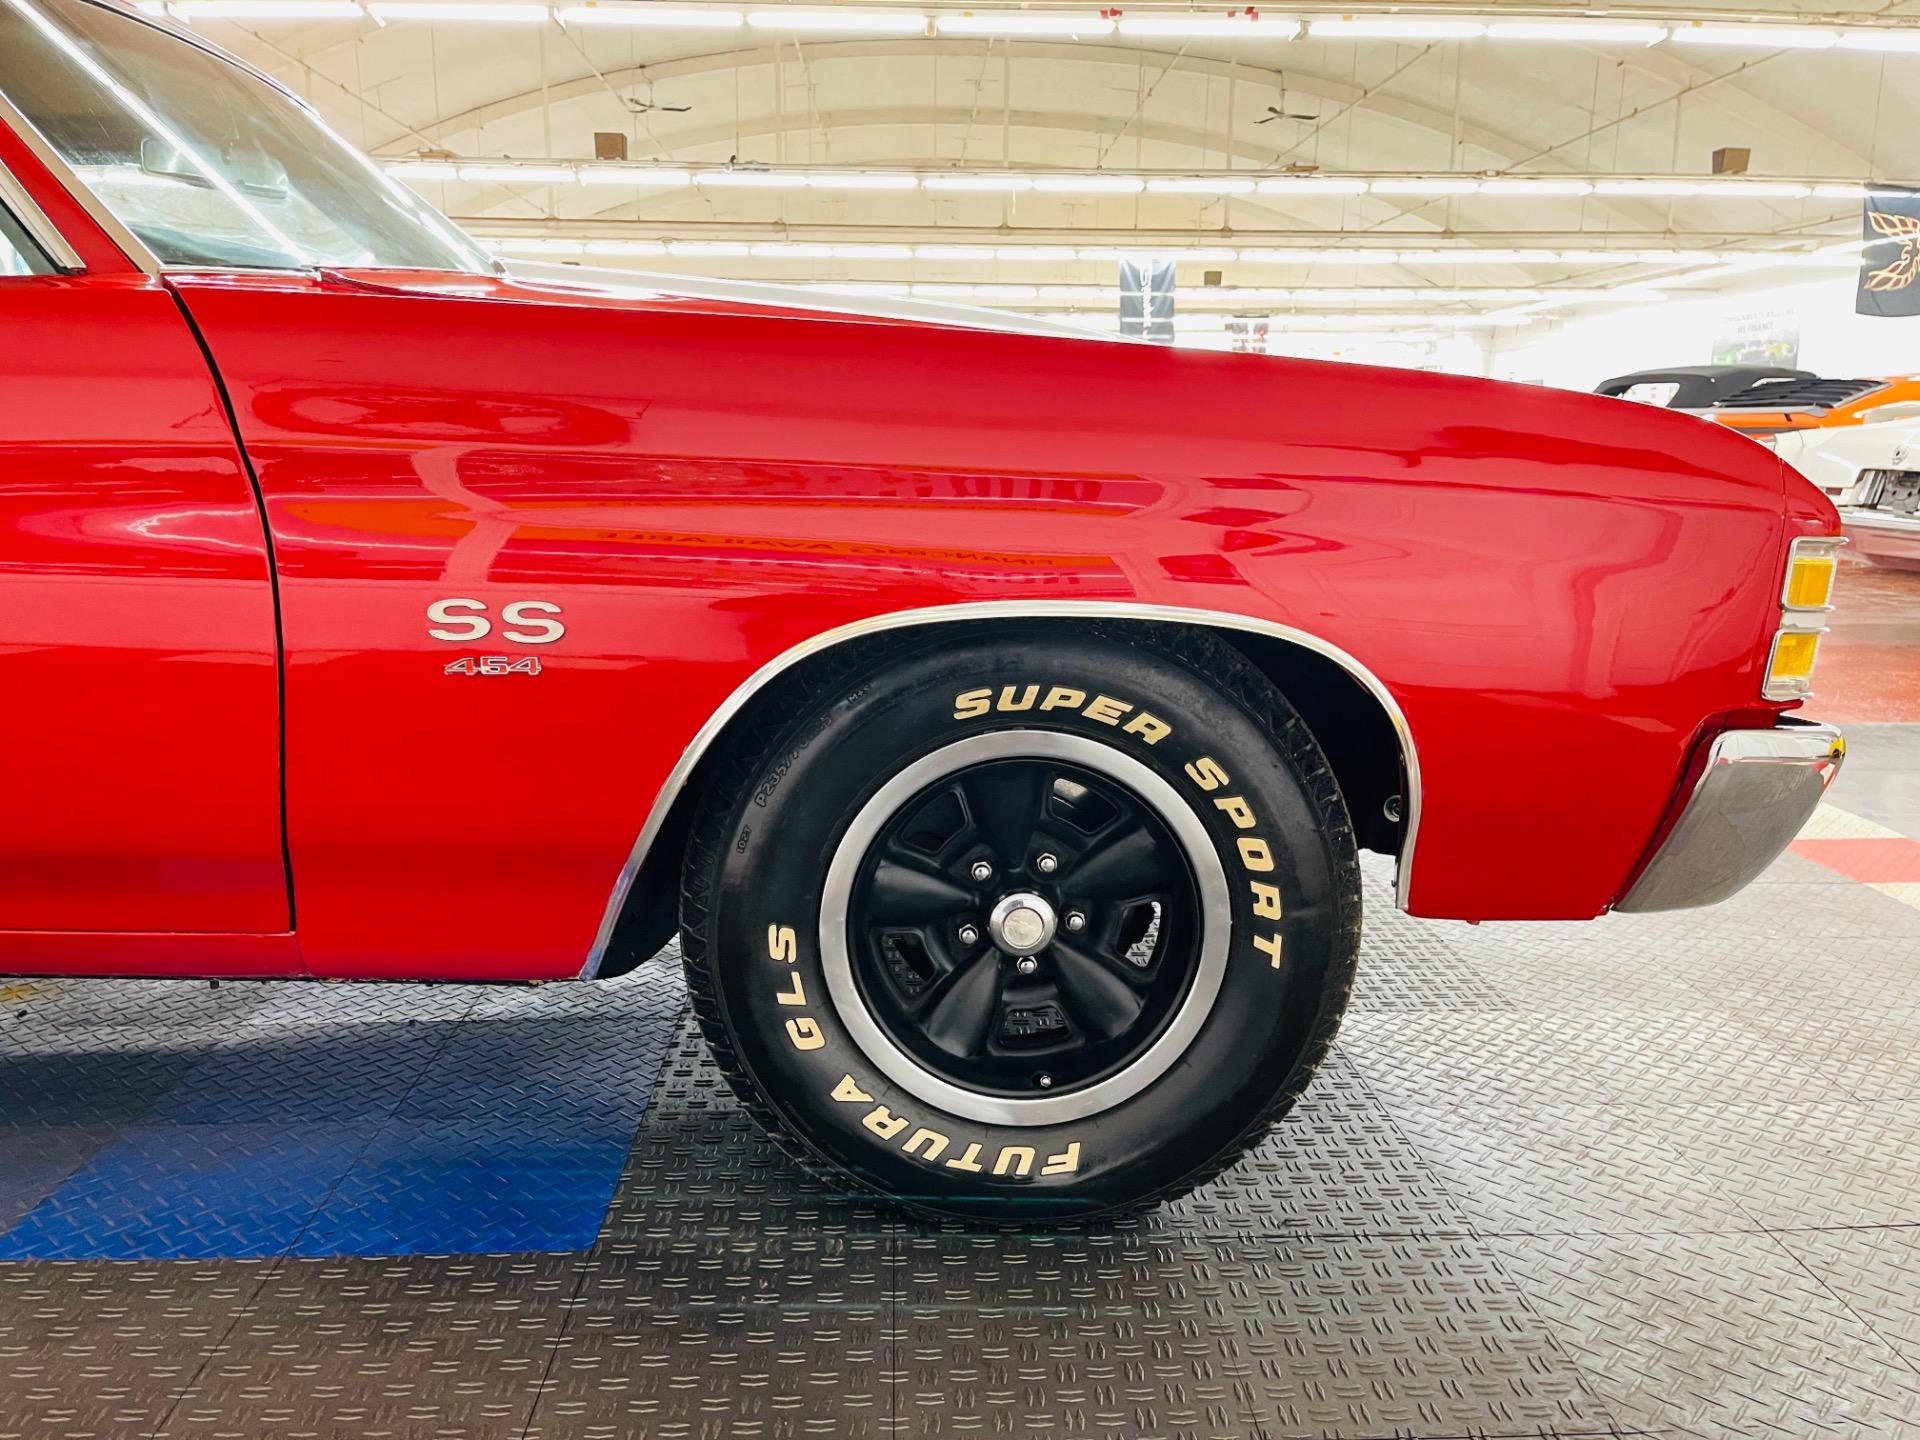 Used 1971 Chevrolet Chevelle - SUPER SPORT - LS5 454 - 4 SPEED - SEE VIDEO - | Mundelein, IL